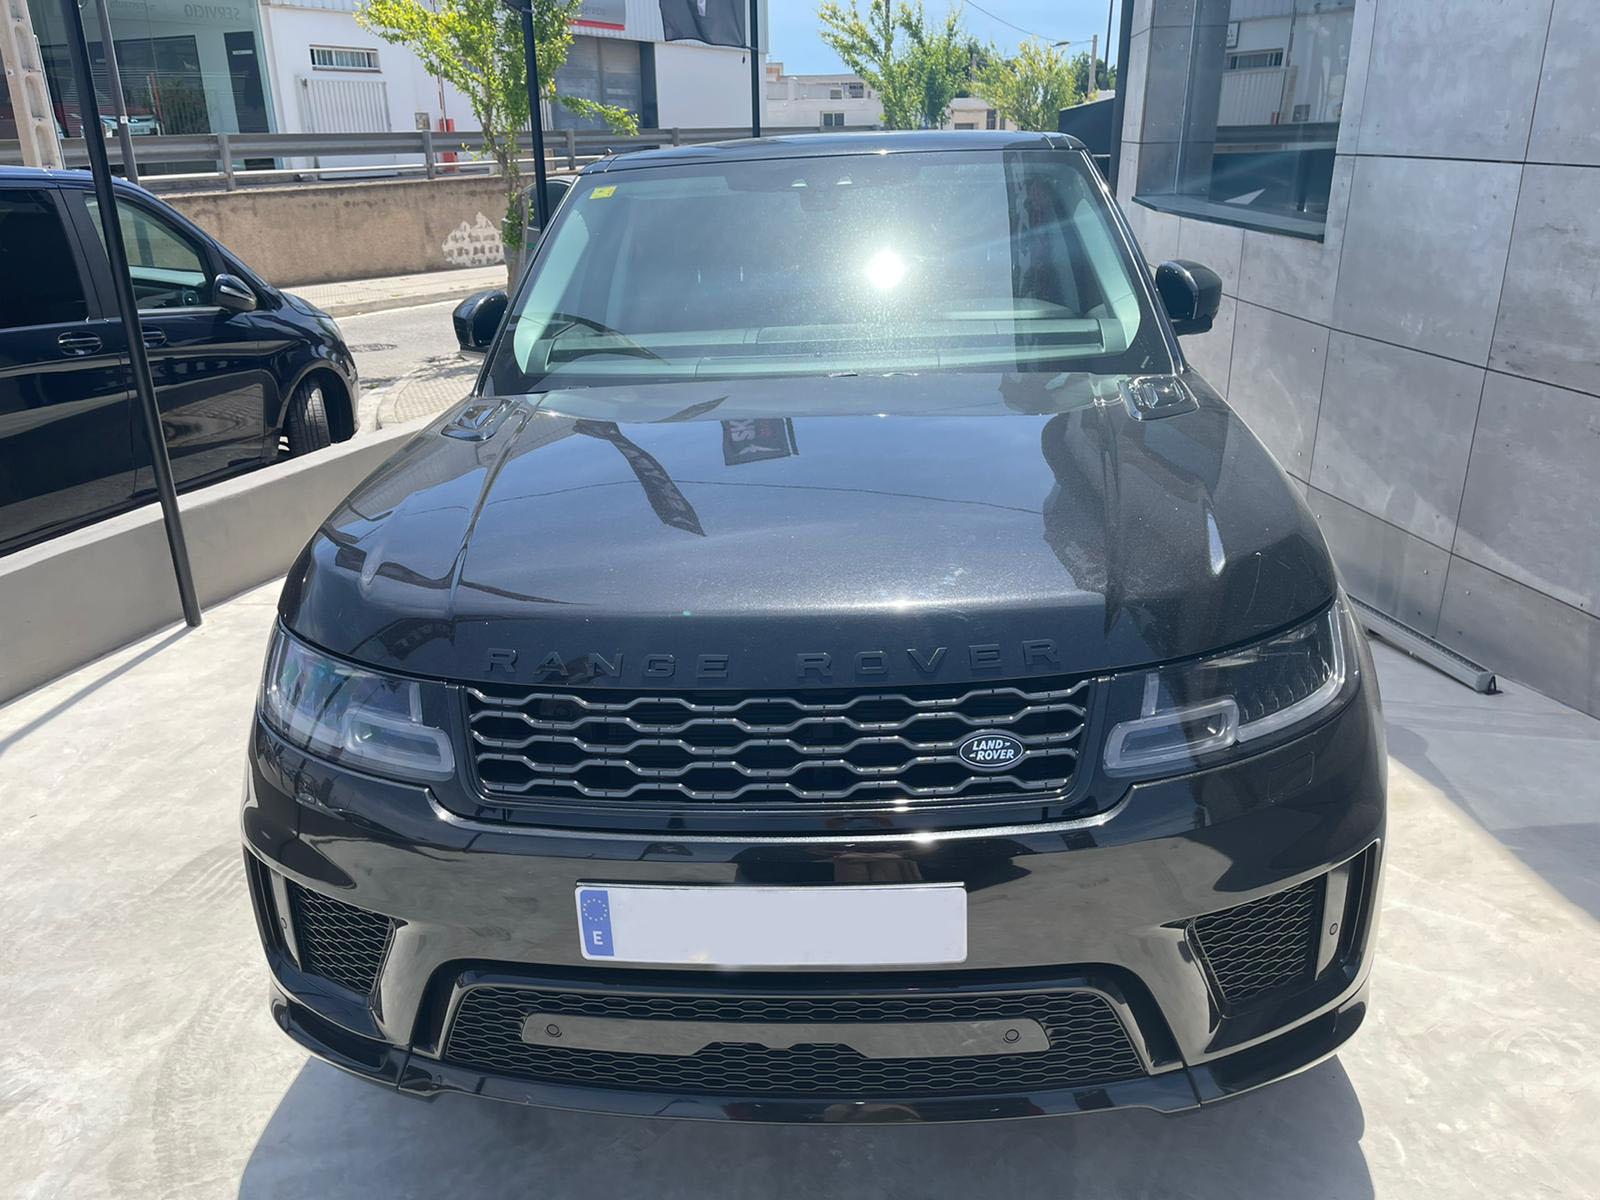 Range Rover Sport 7 seats Rental Ibiza